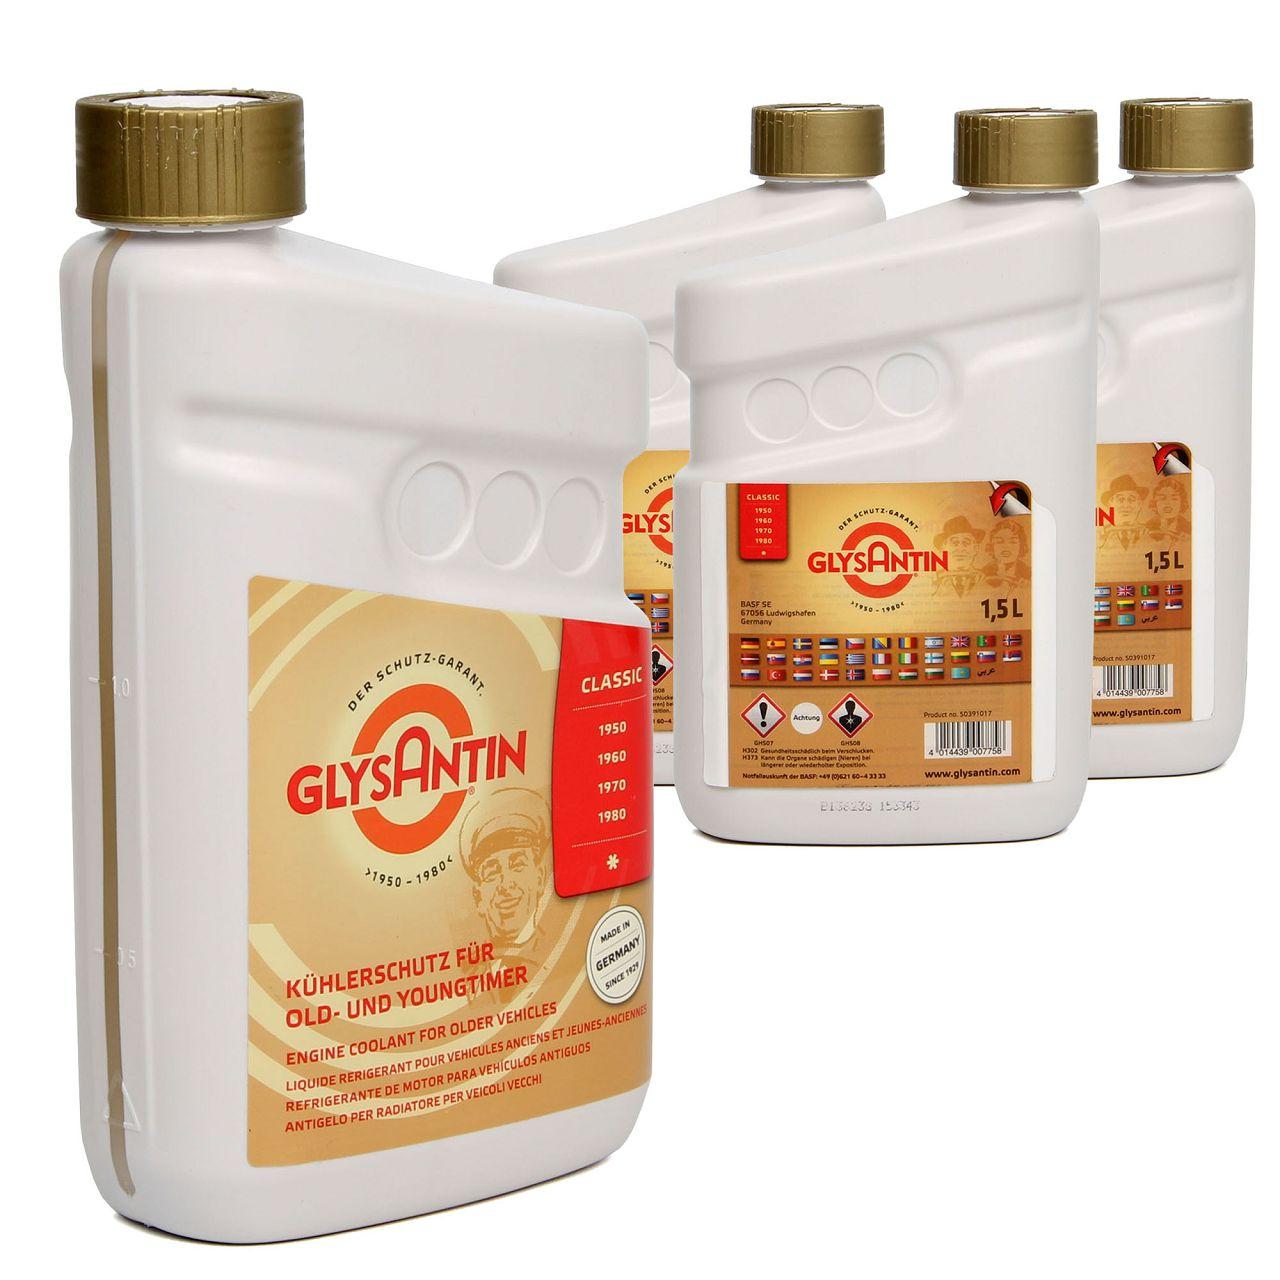 BASF GLYSANTIN Frostschutz Kühlerfrostschutz CLASSIC OLDTIMER YOUNGTIMER 6,0 L